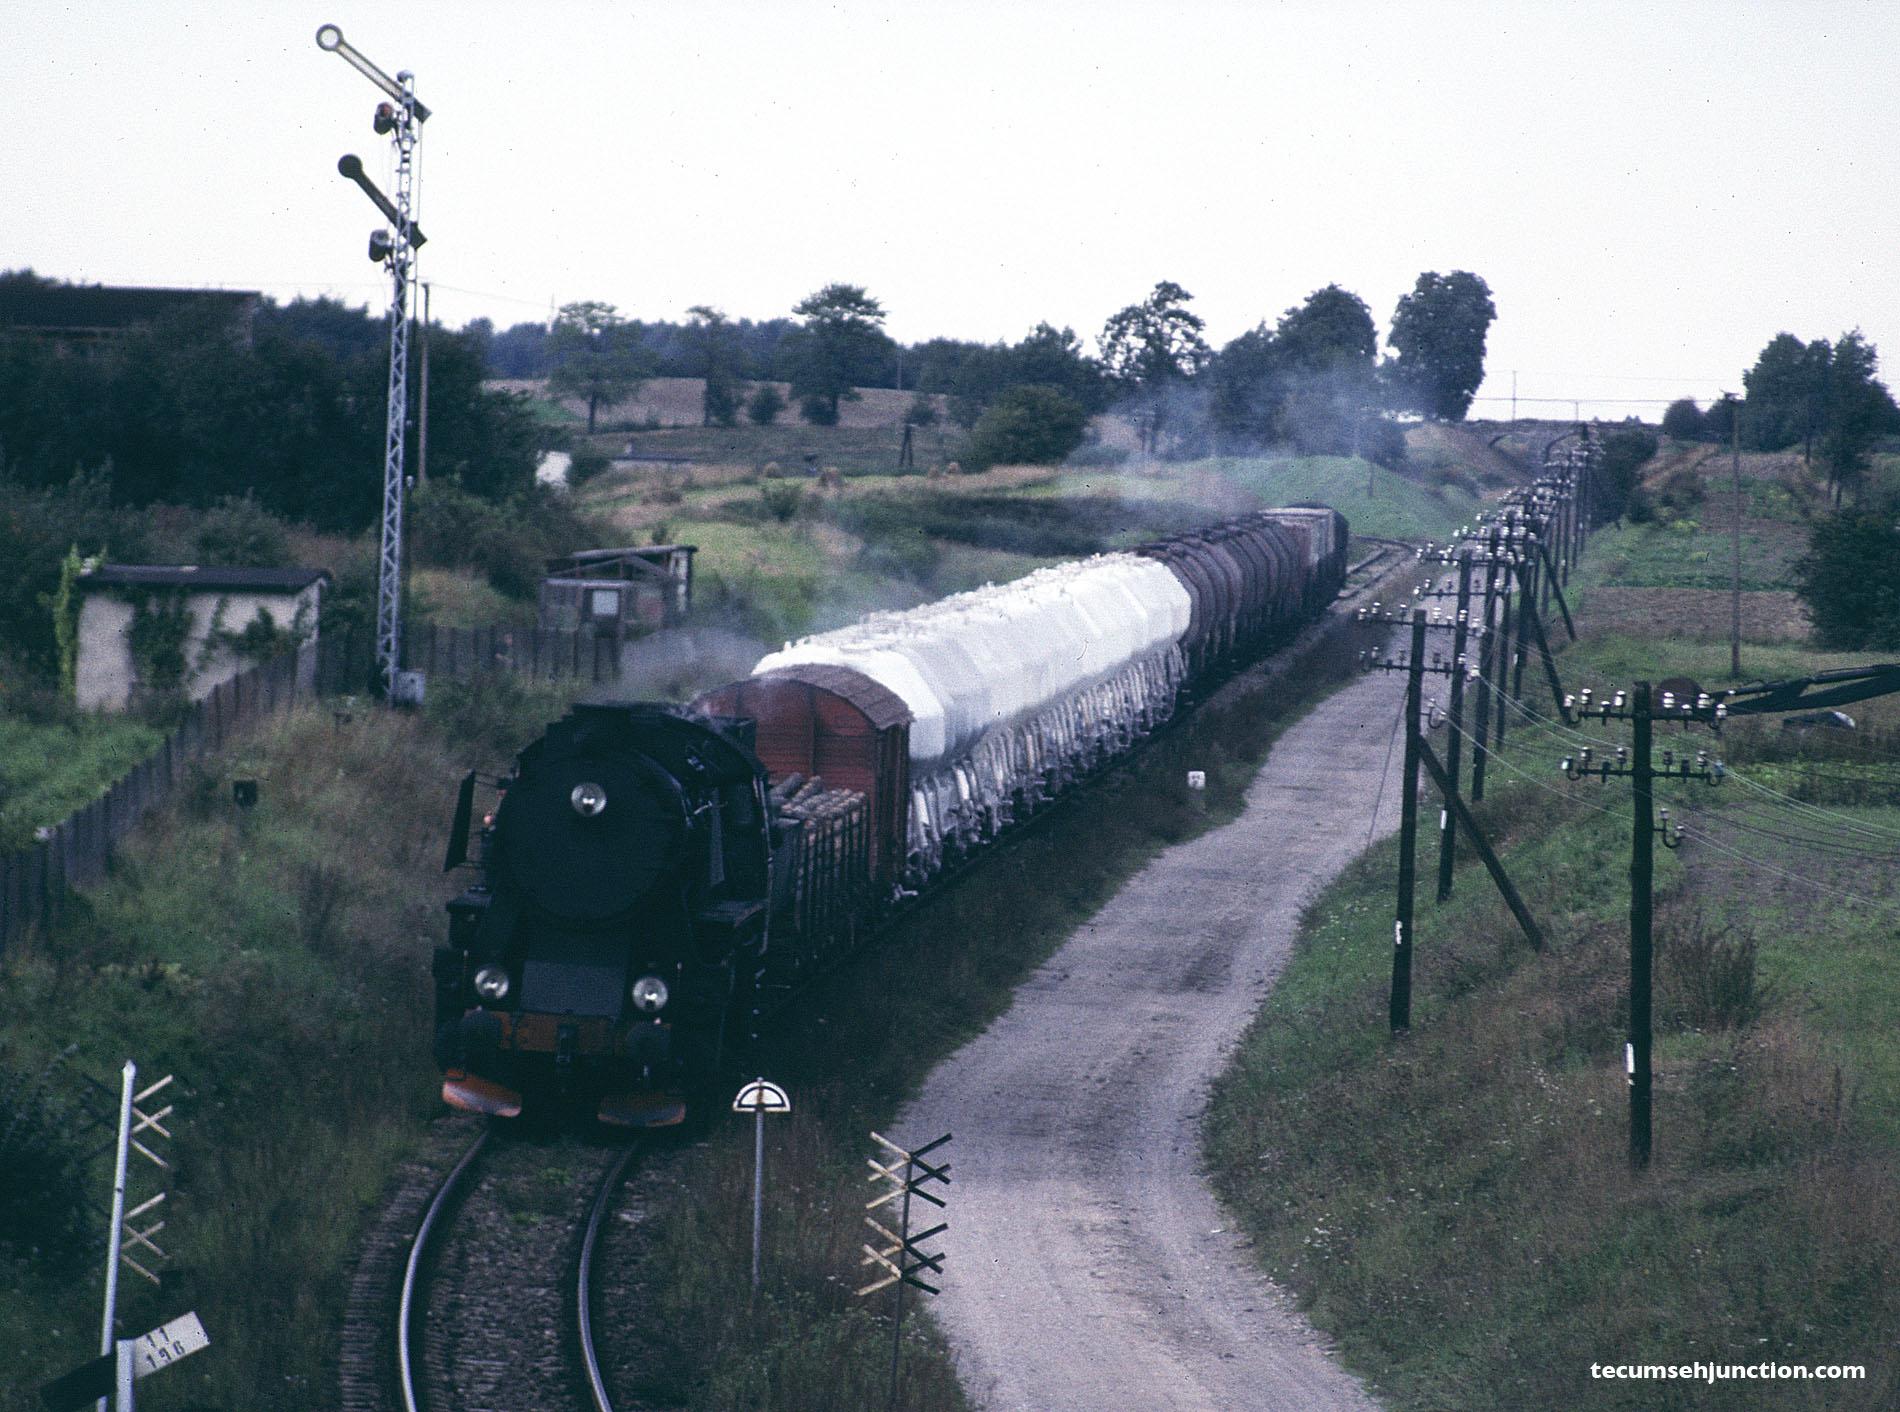 A PKP Ty2 or Ty42 arrives at Kościerzyna, Poland with a train from Lipusz